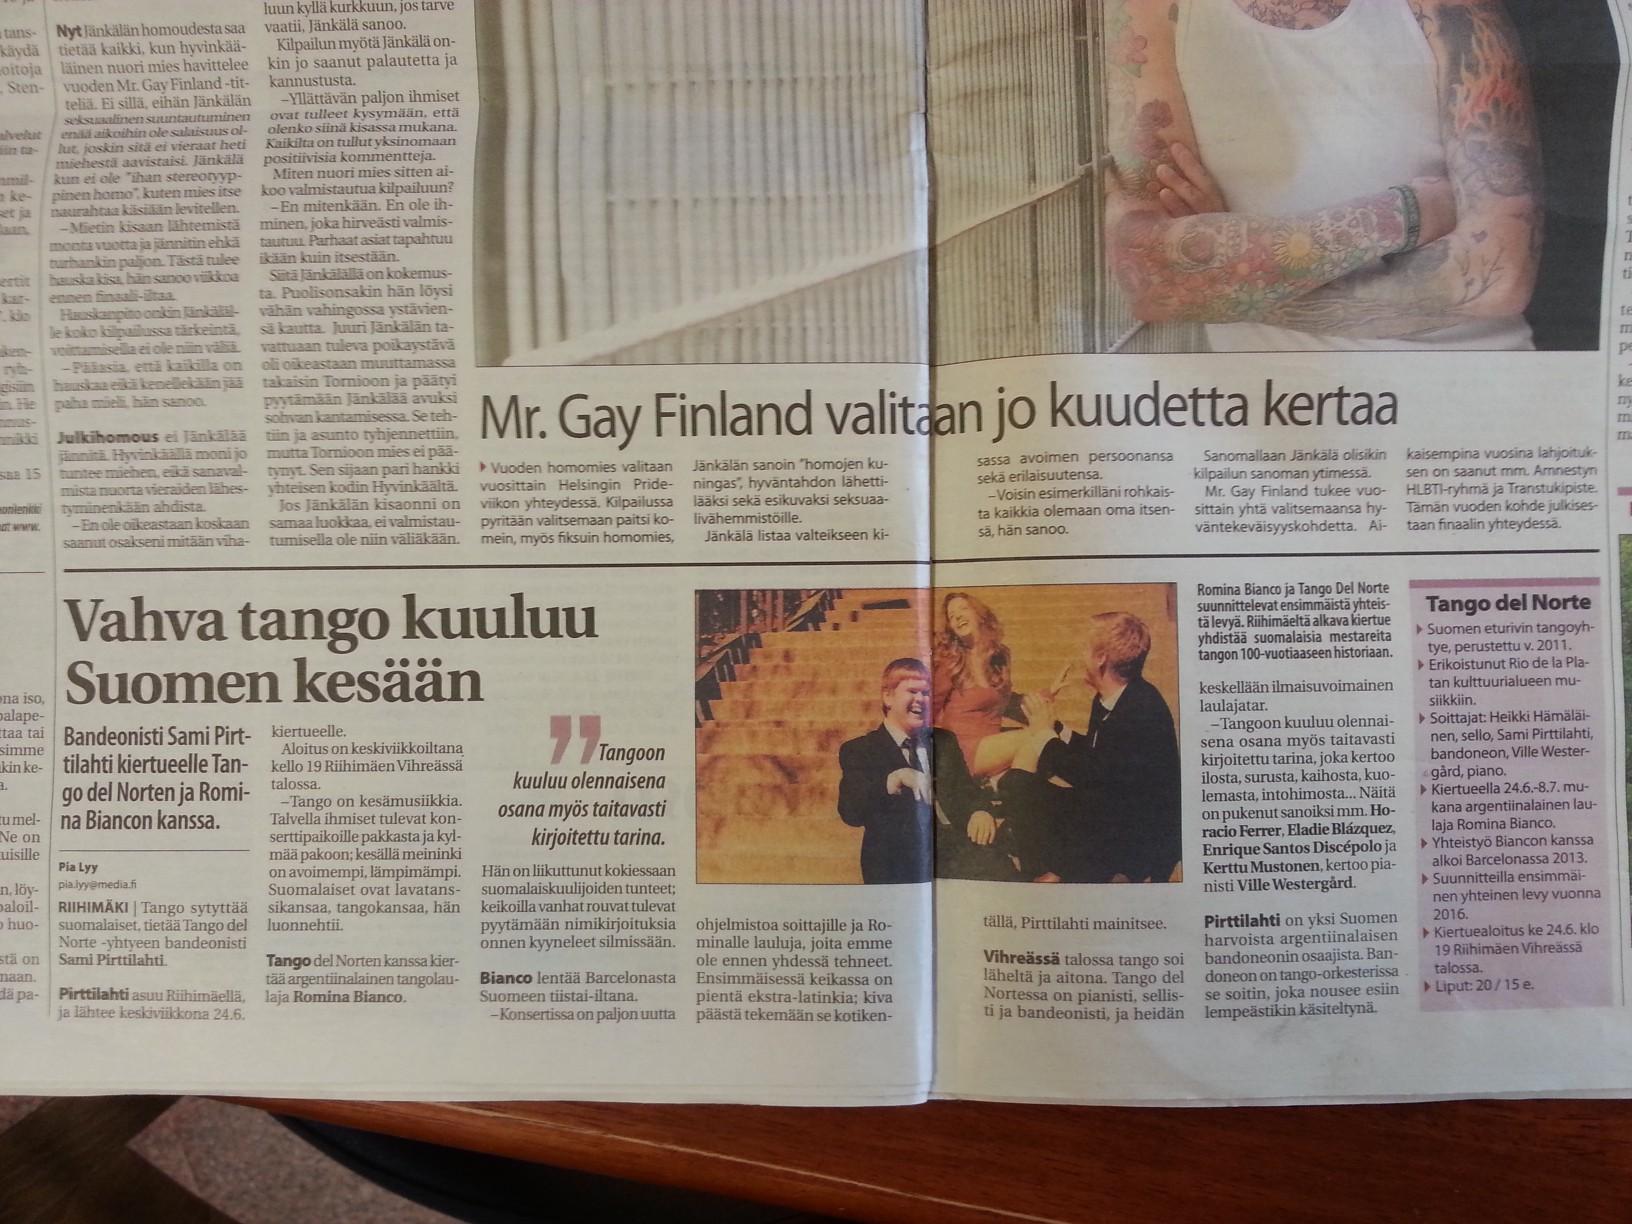 Gira de verano Finlandia 2015